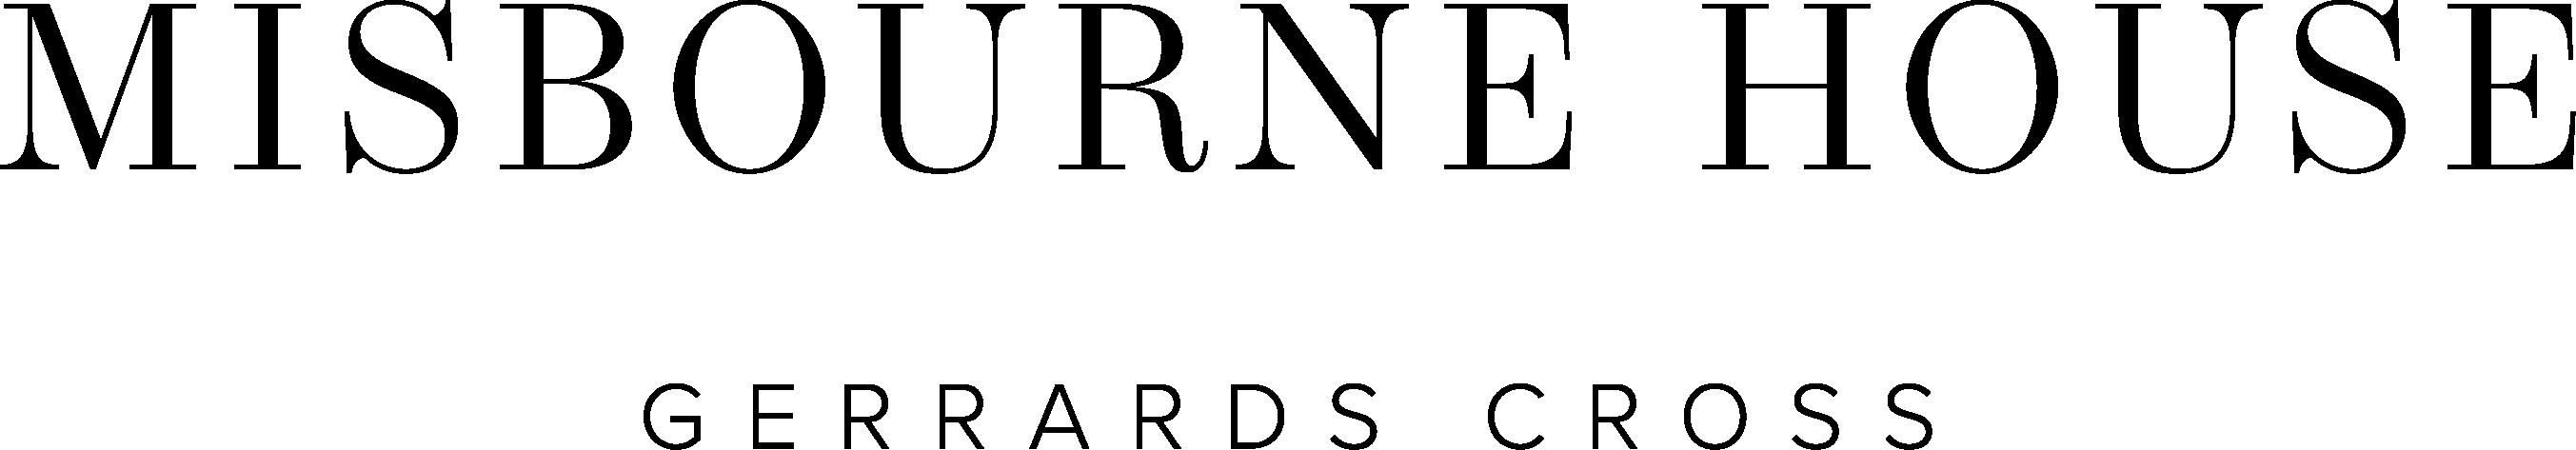 Misbourne House logo word mark min width 63mm black RGB